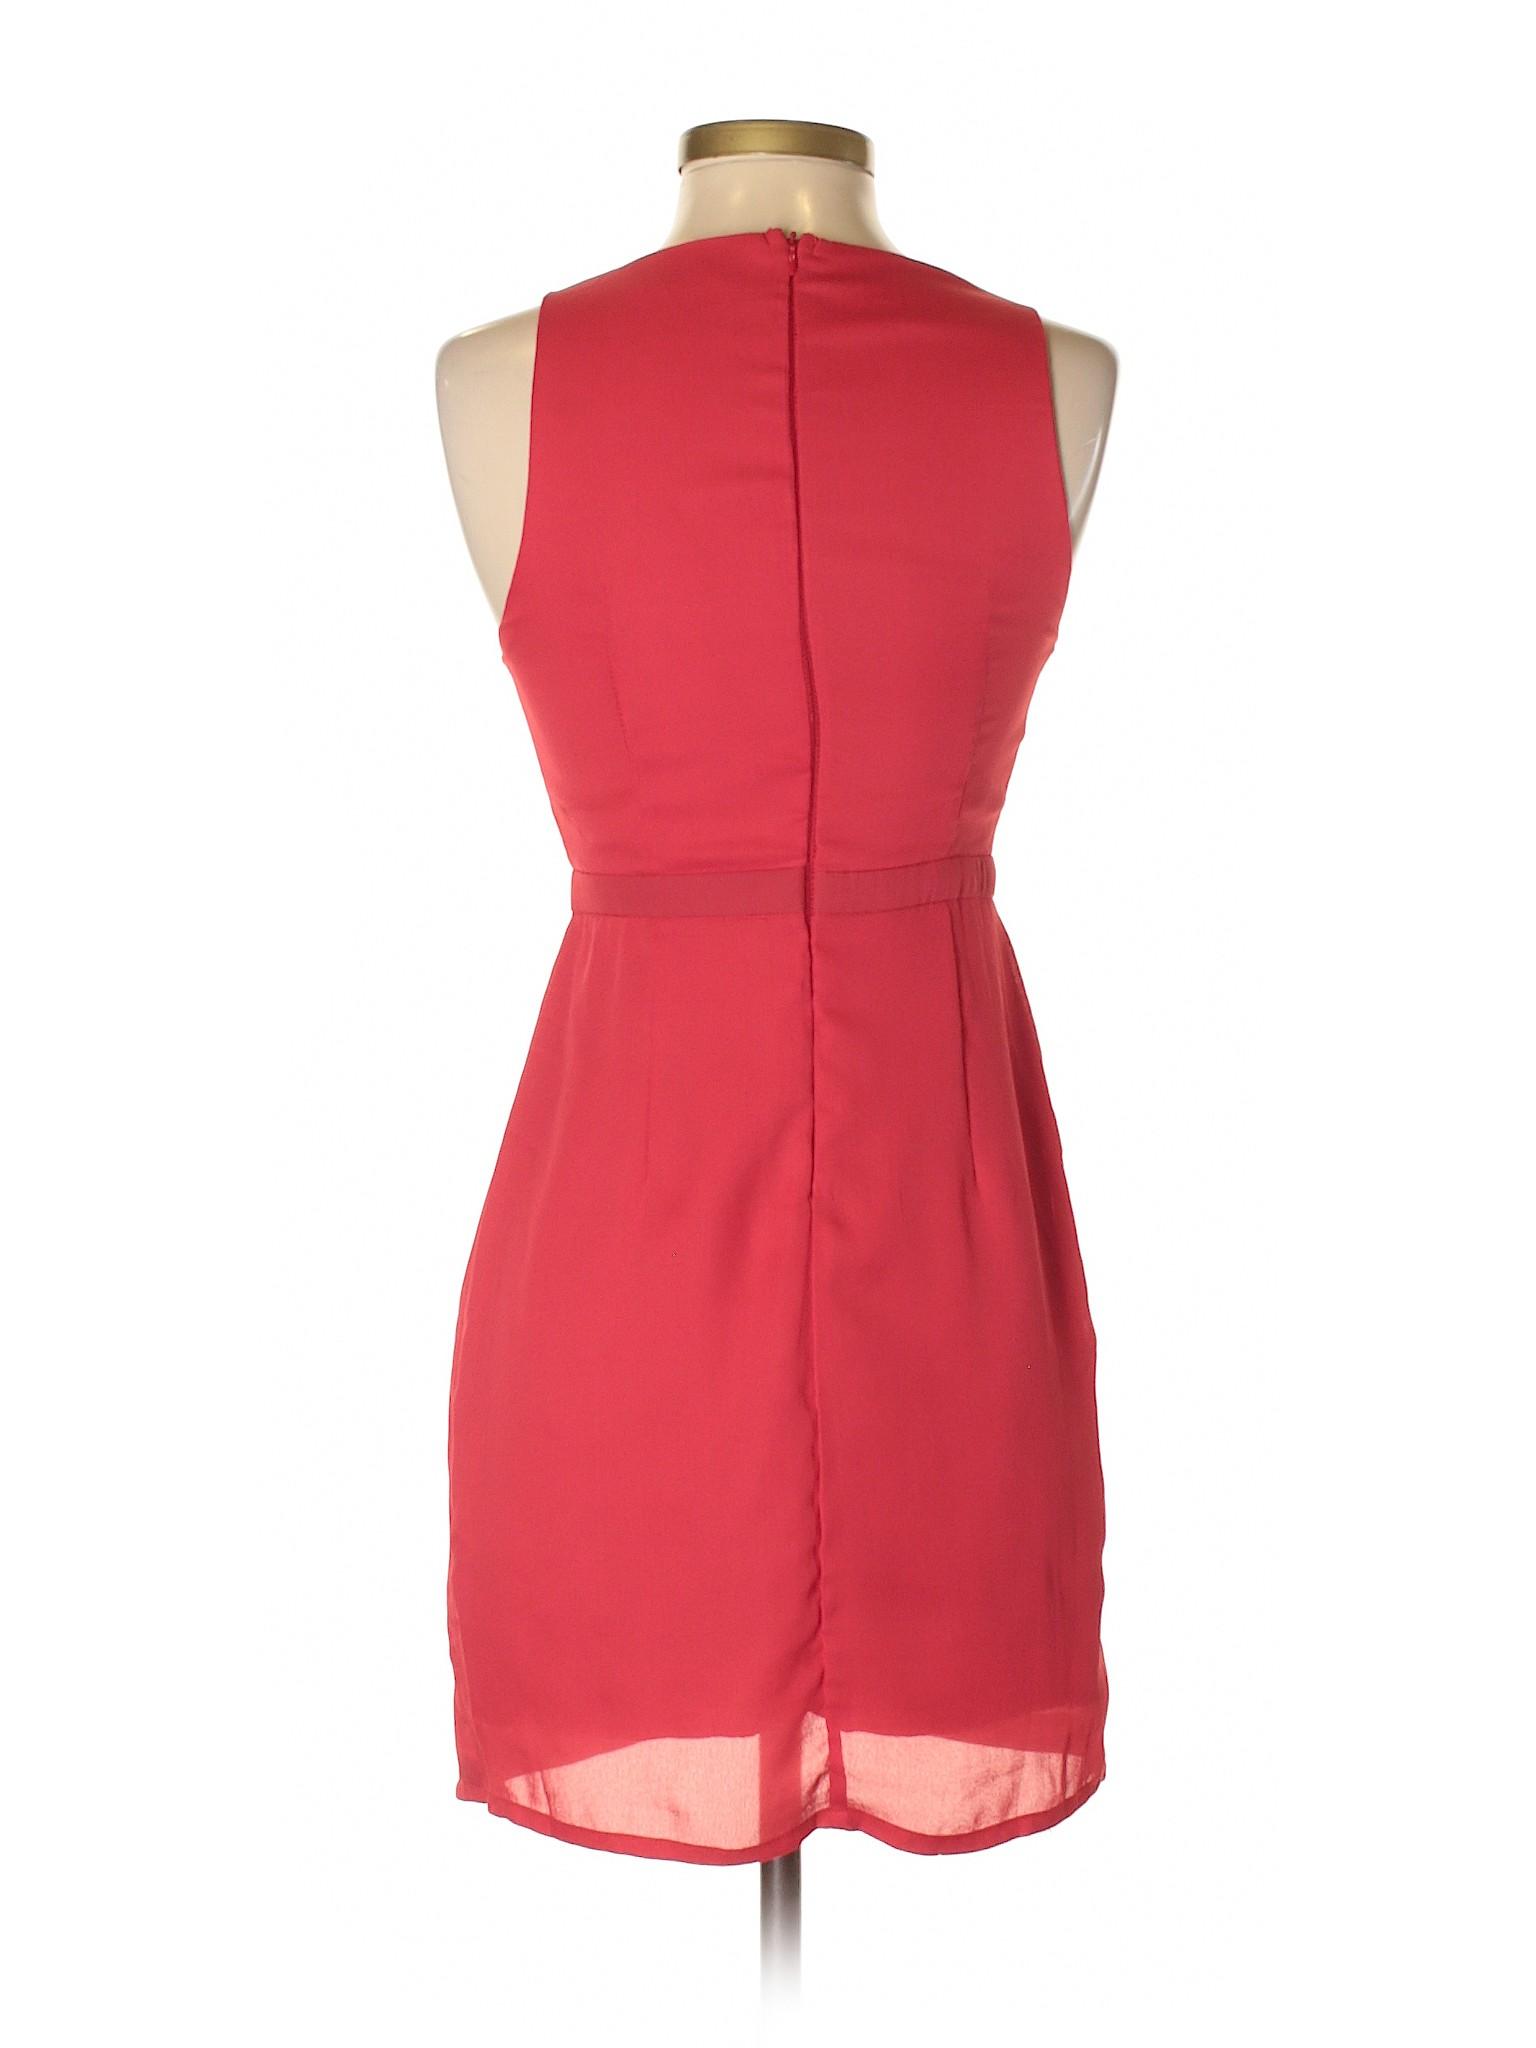 TOBI winter Boutique winter Dress Boutique Casual xtTwqzw